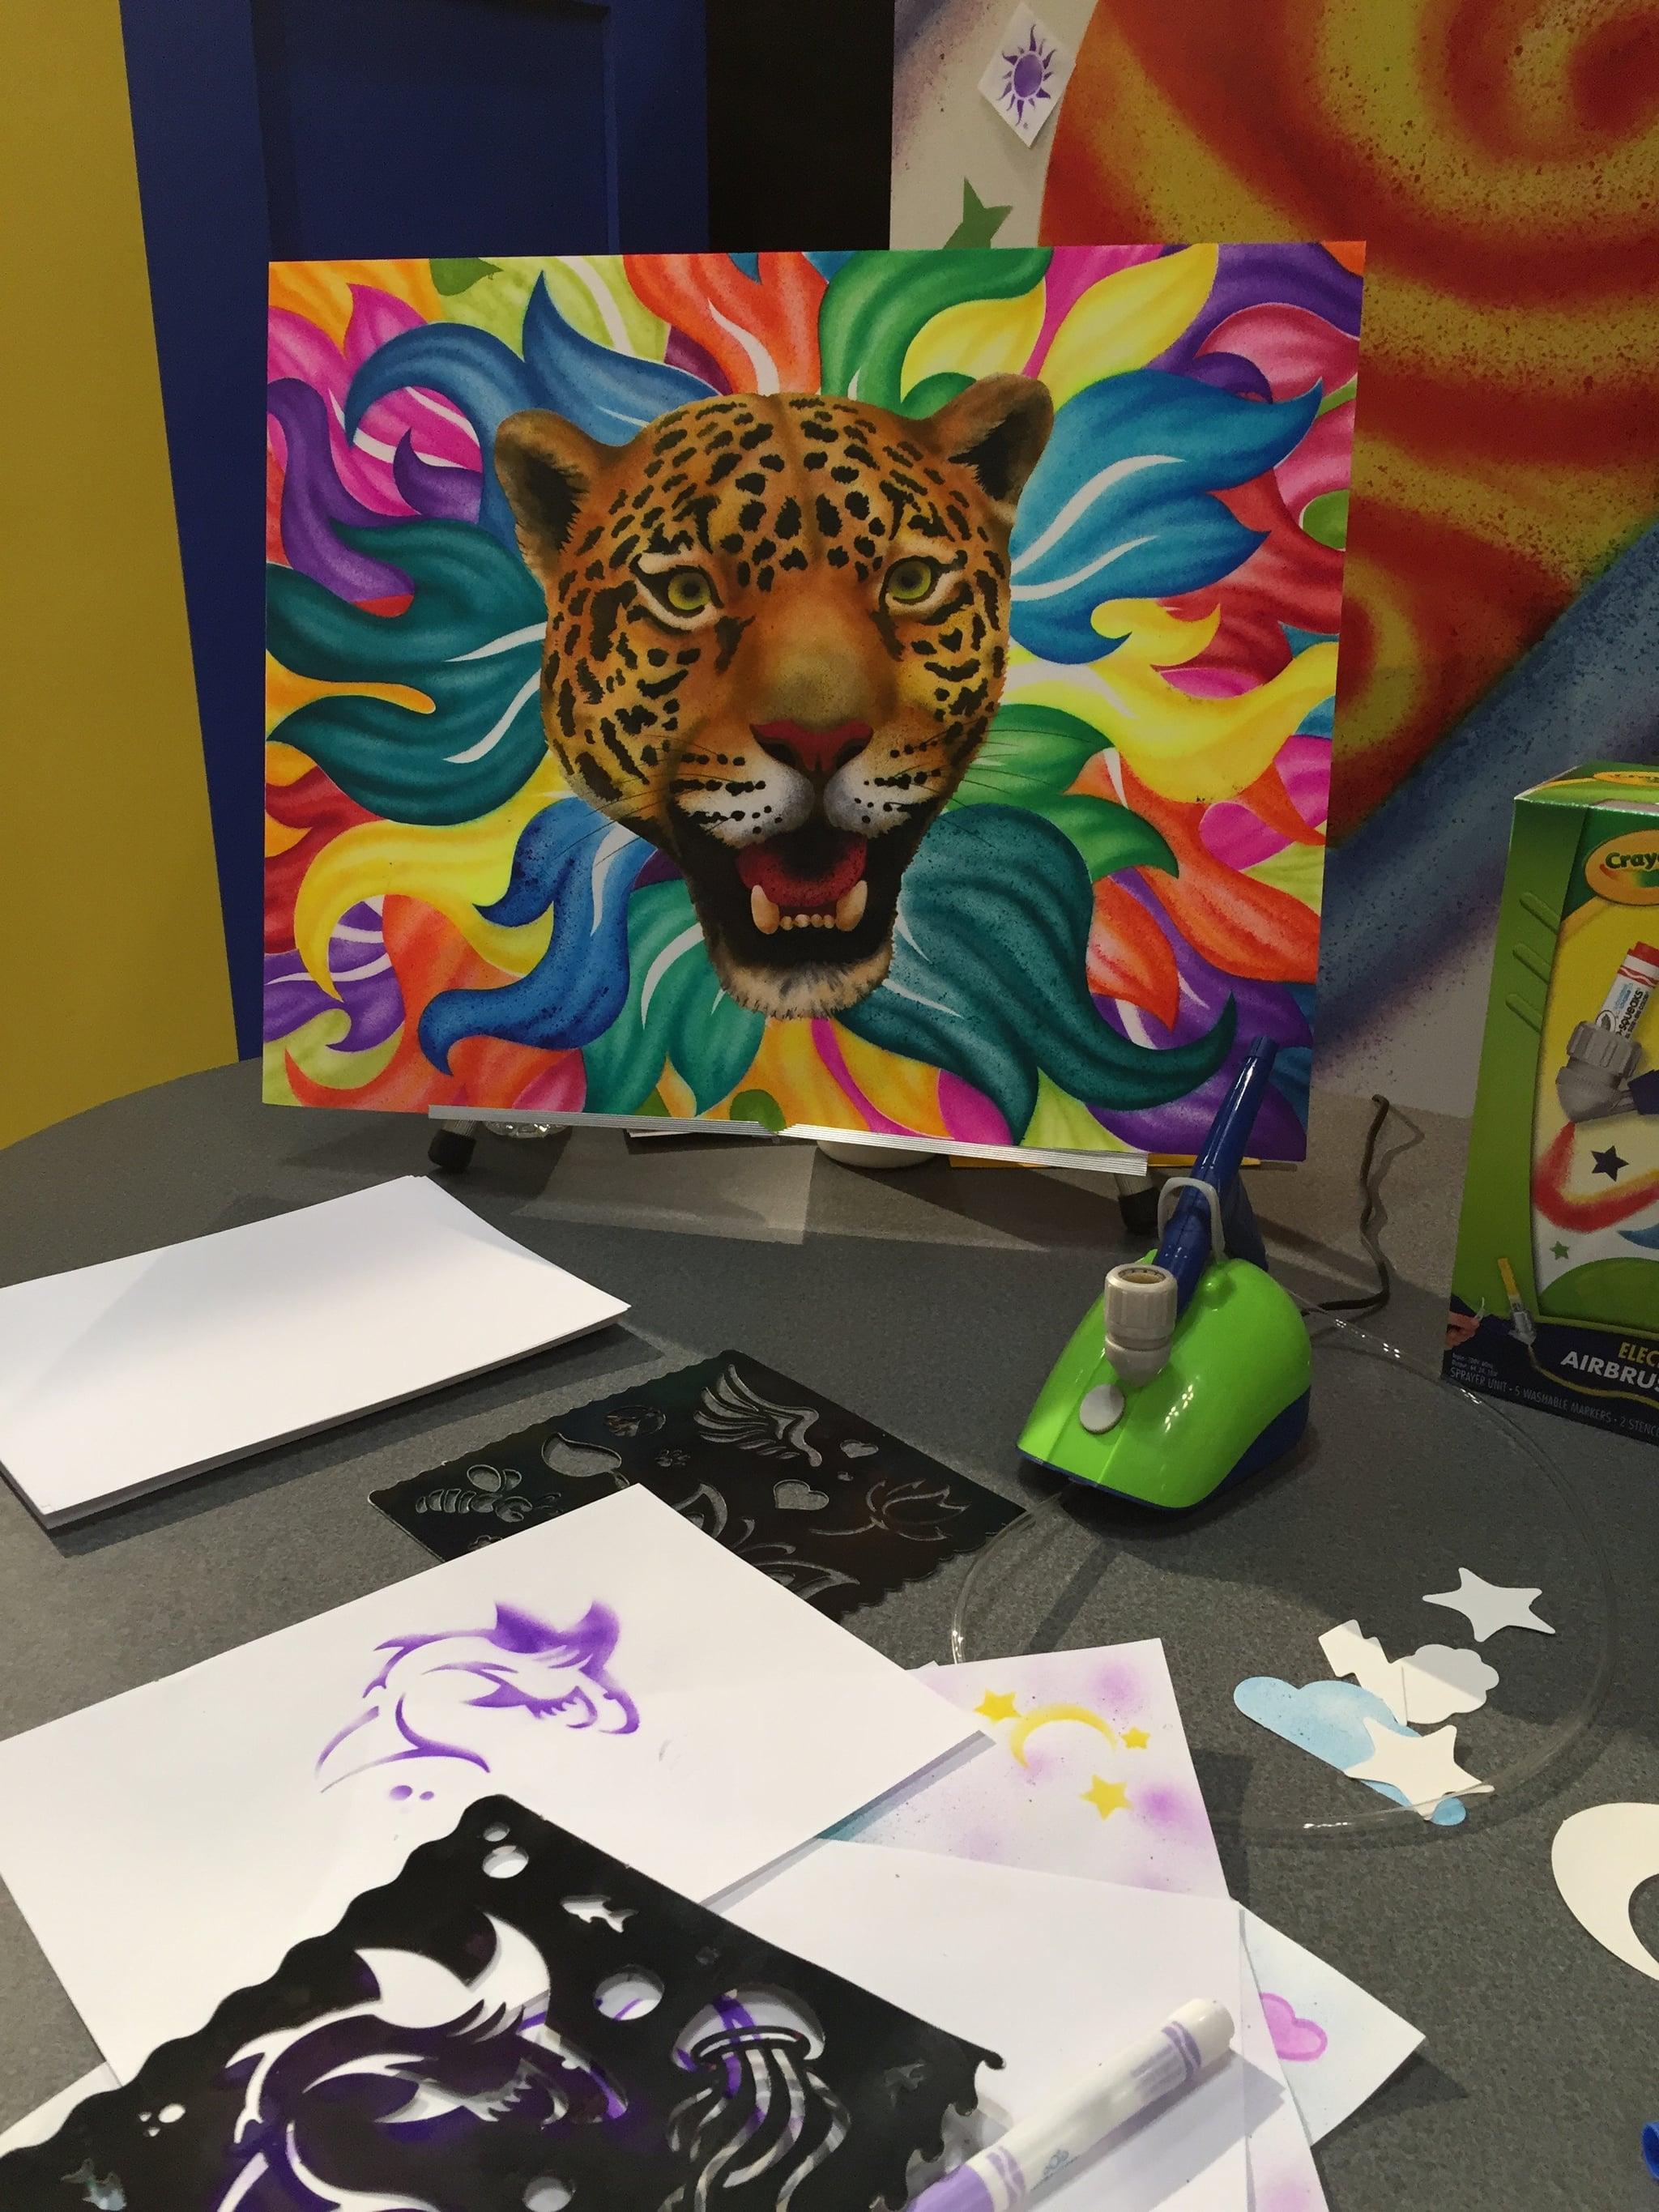 Crayola Air Marker Sprayer See All 170 Brand New Toys